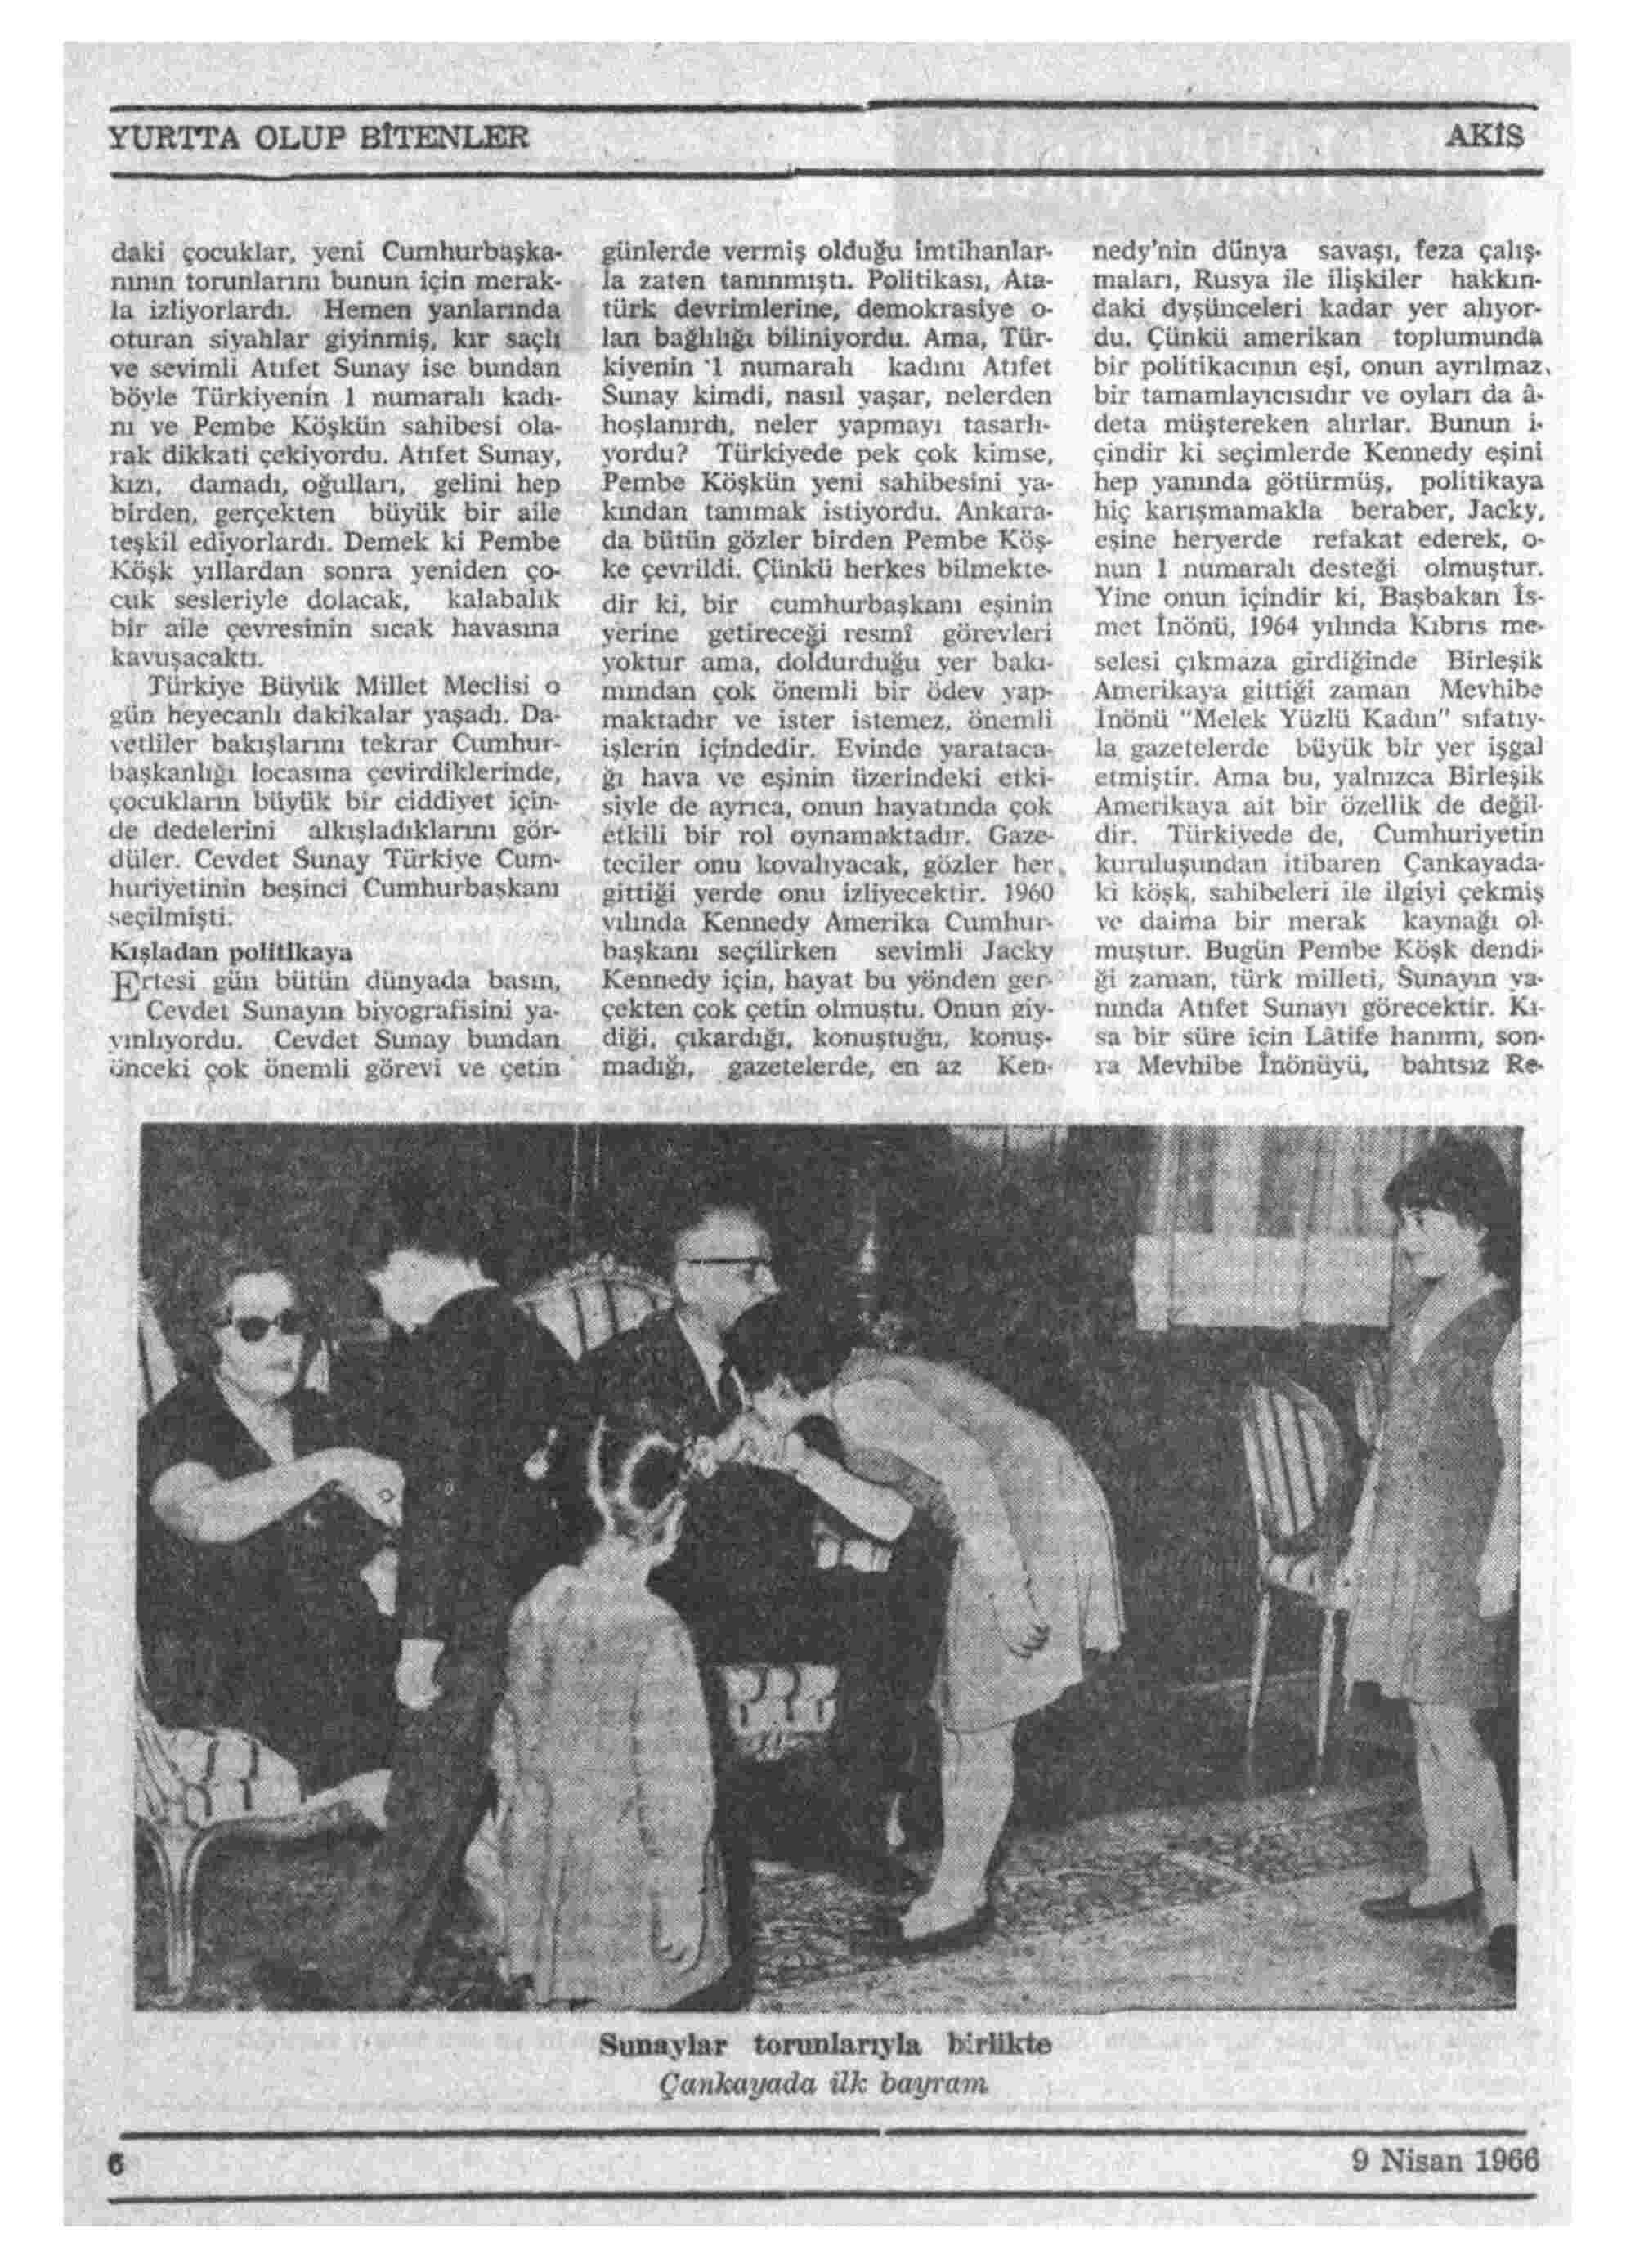 9 Nisan 1966 Tarihli Akis Dergisi Sayfa 6